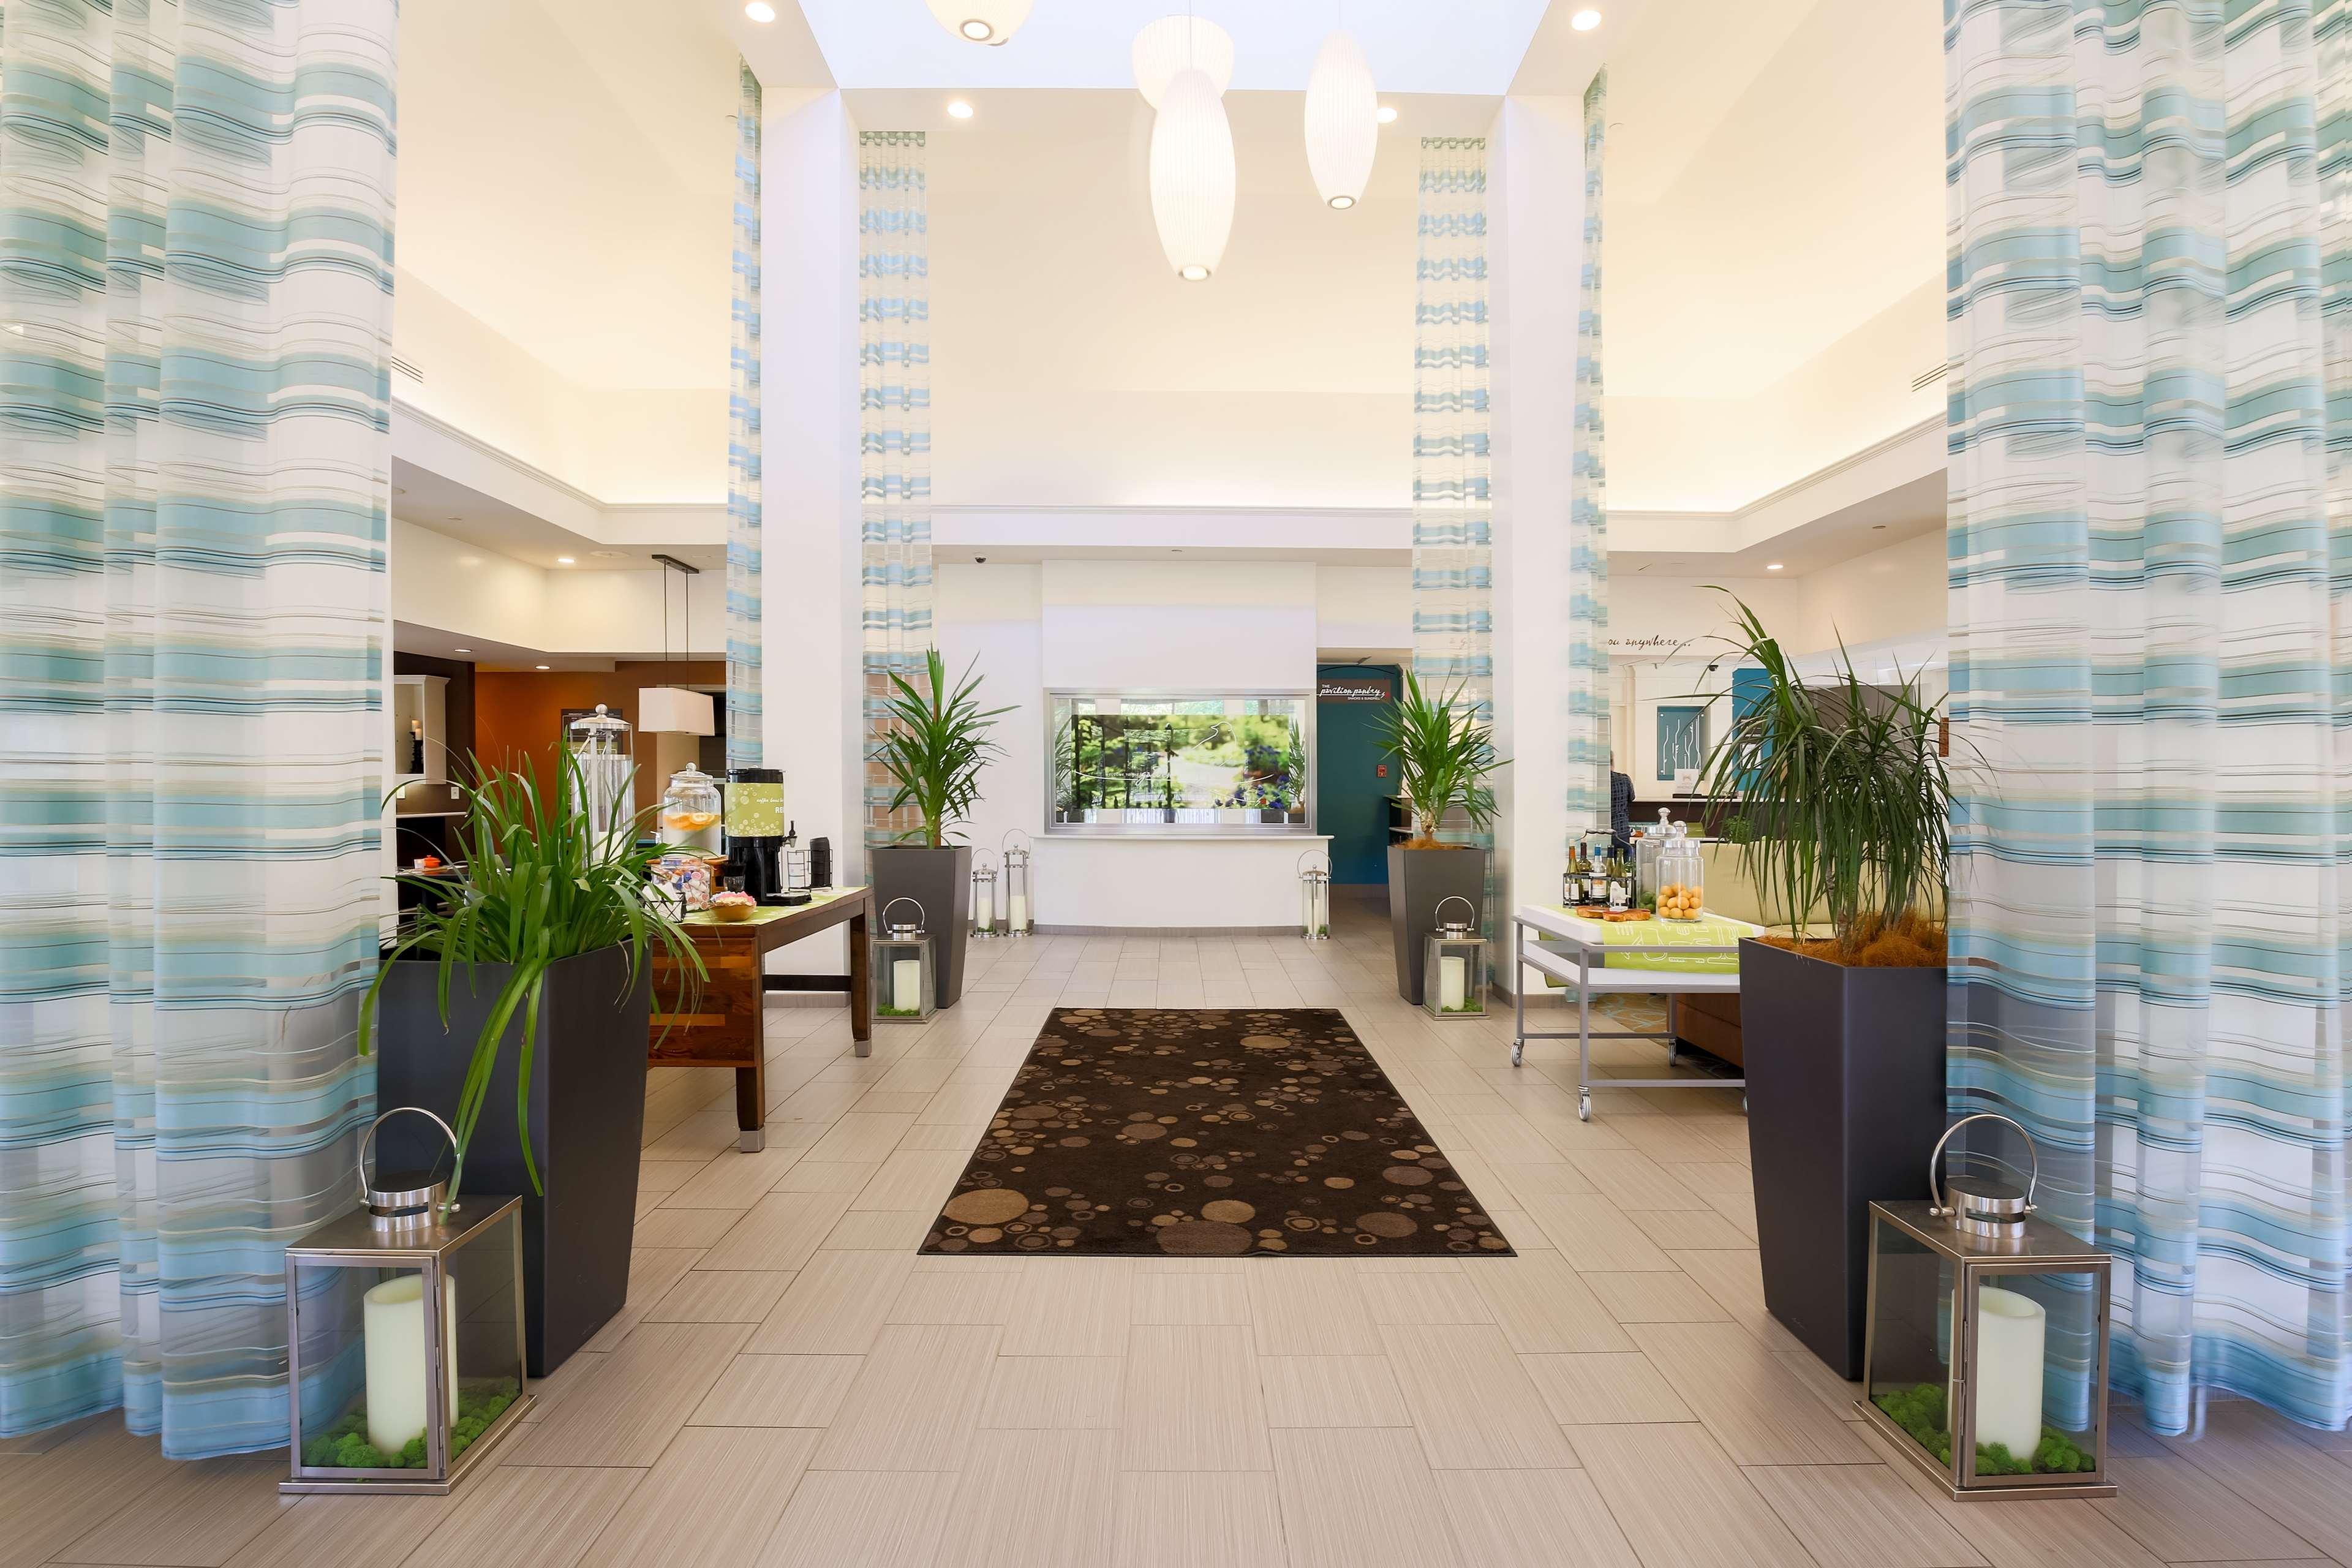 Hilton Garden Inn Nanuet image 7